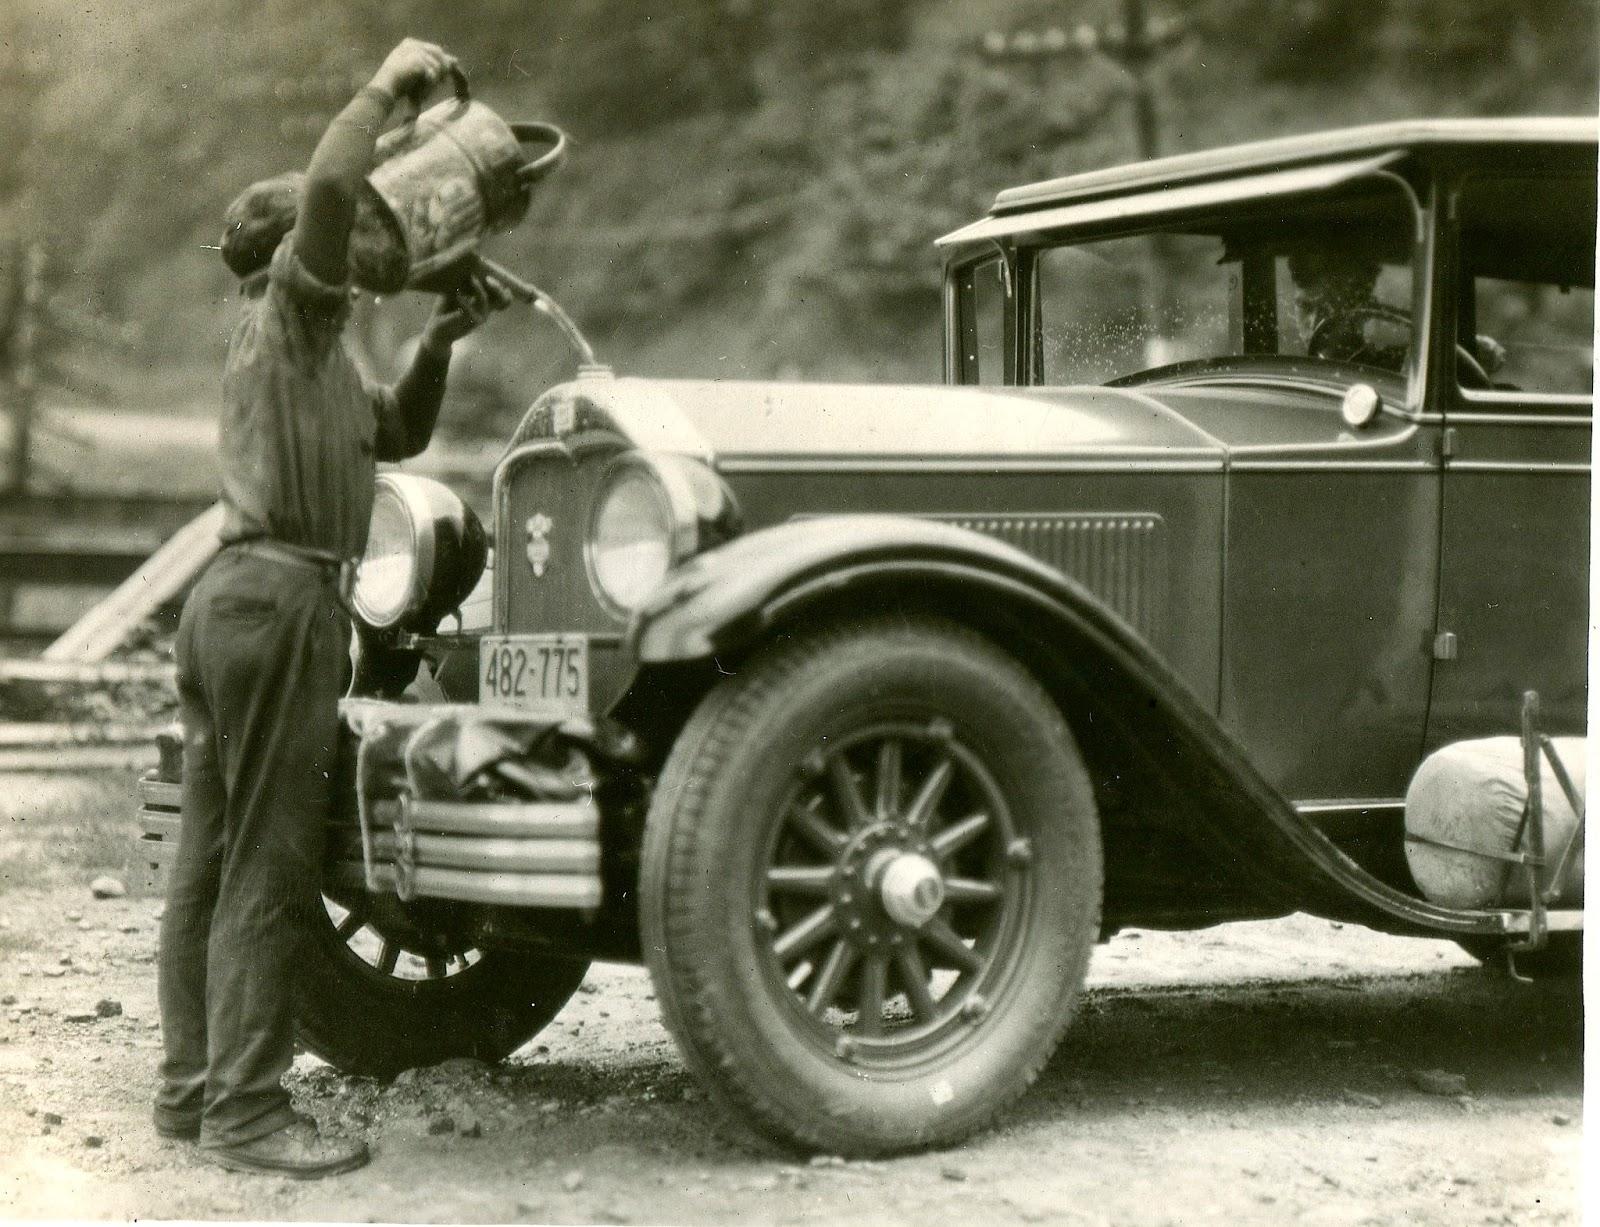 1927BoyWateringCanRadiatorBigWateringTro